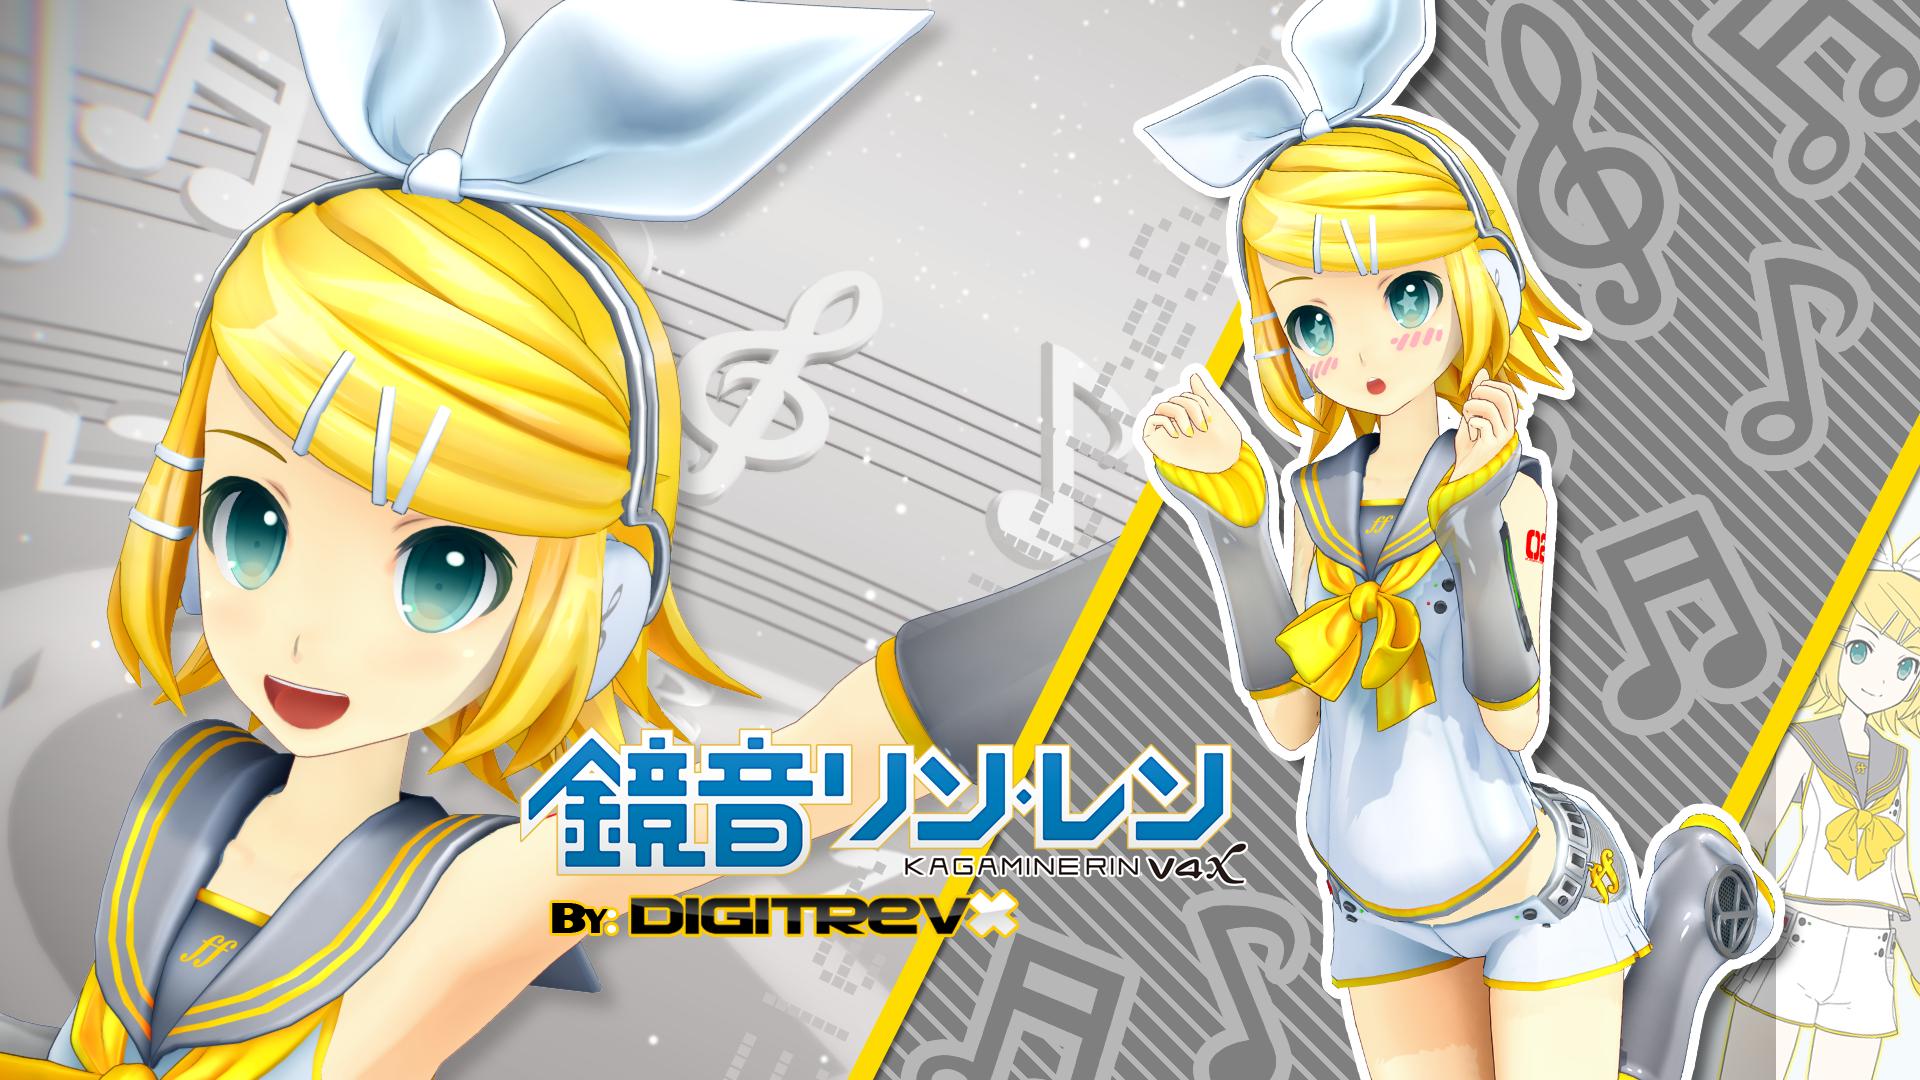 Kagamine Rin V4X Model by Digitrevx